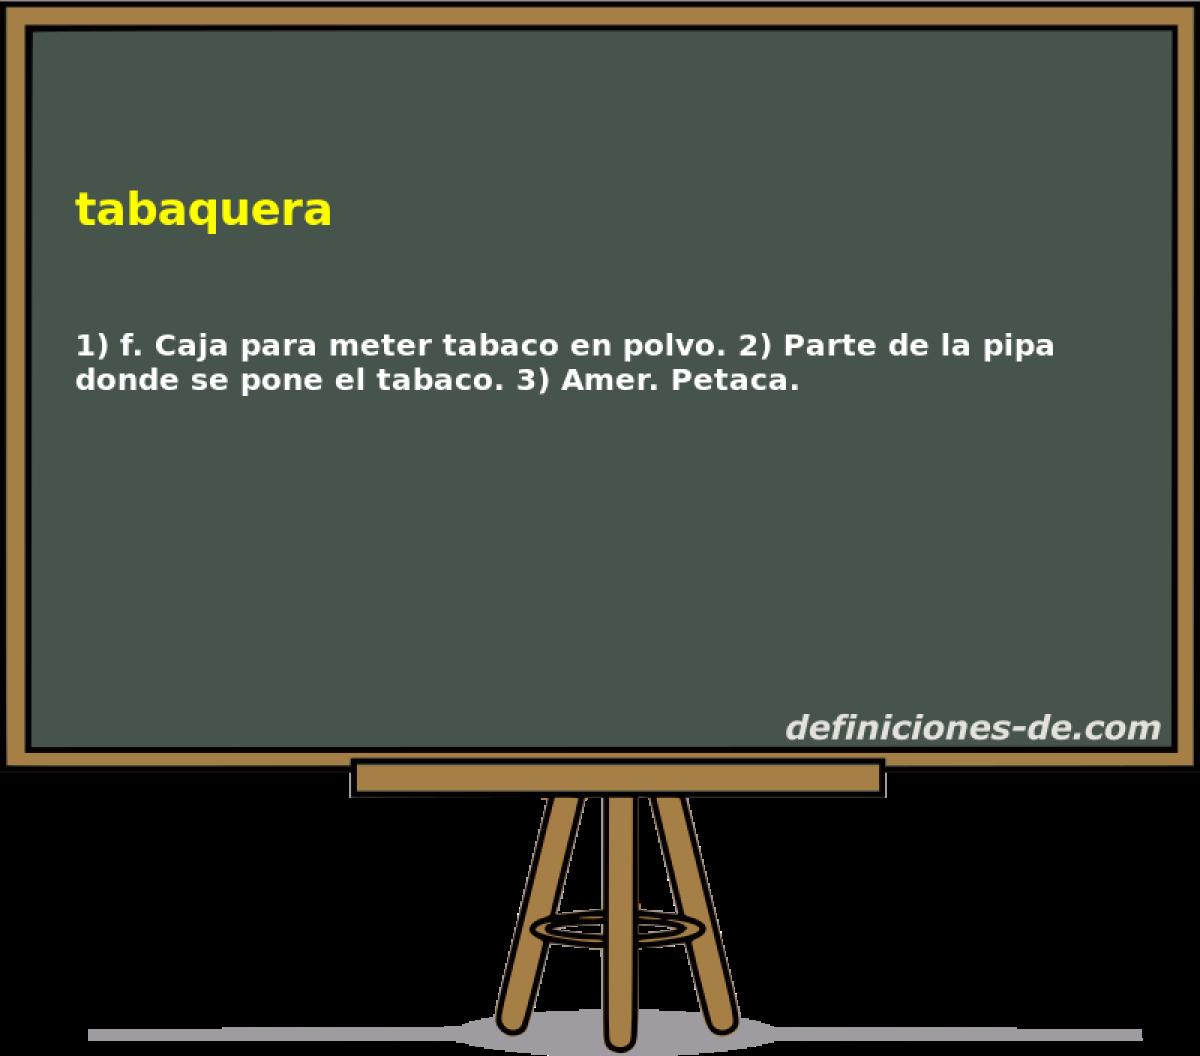 Qué significa Tabaquera?